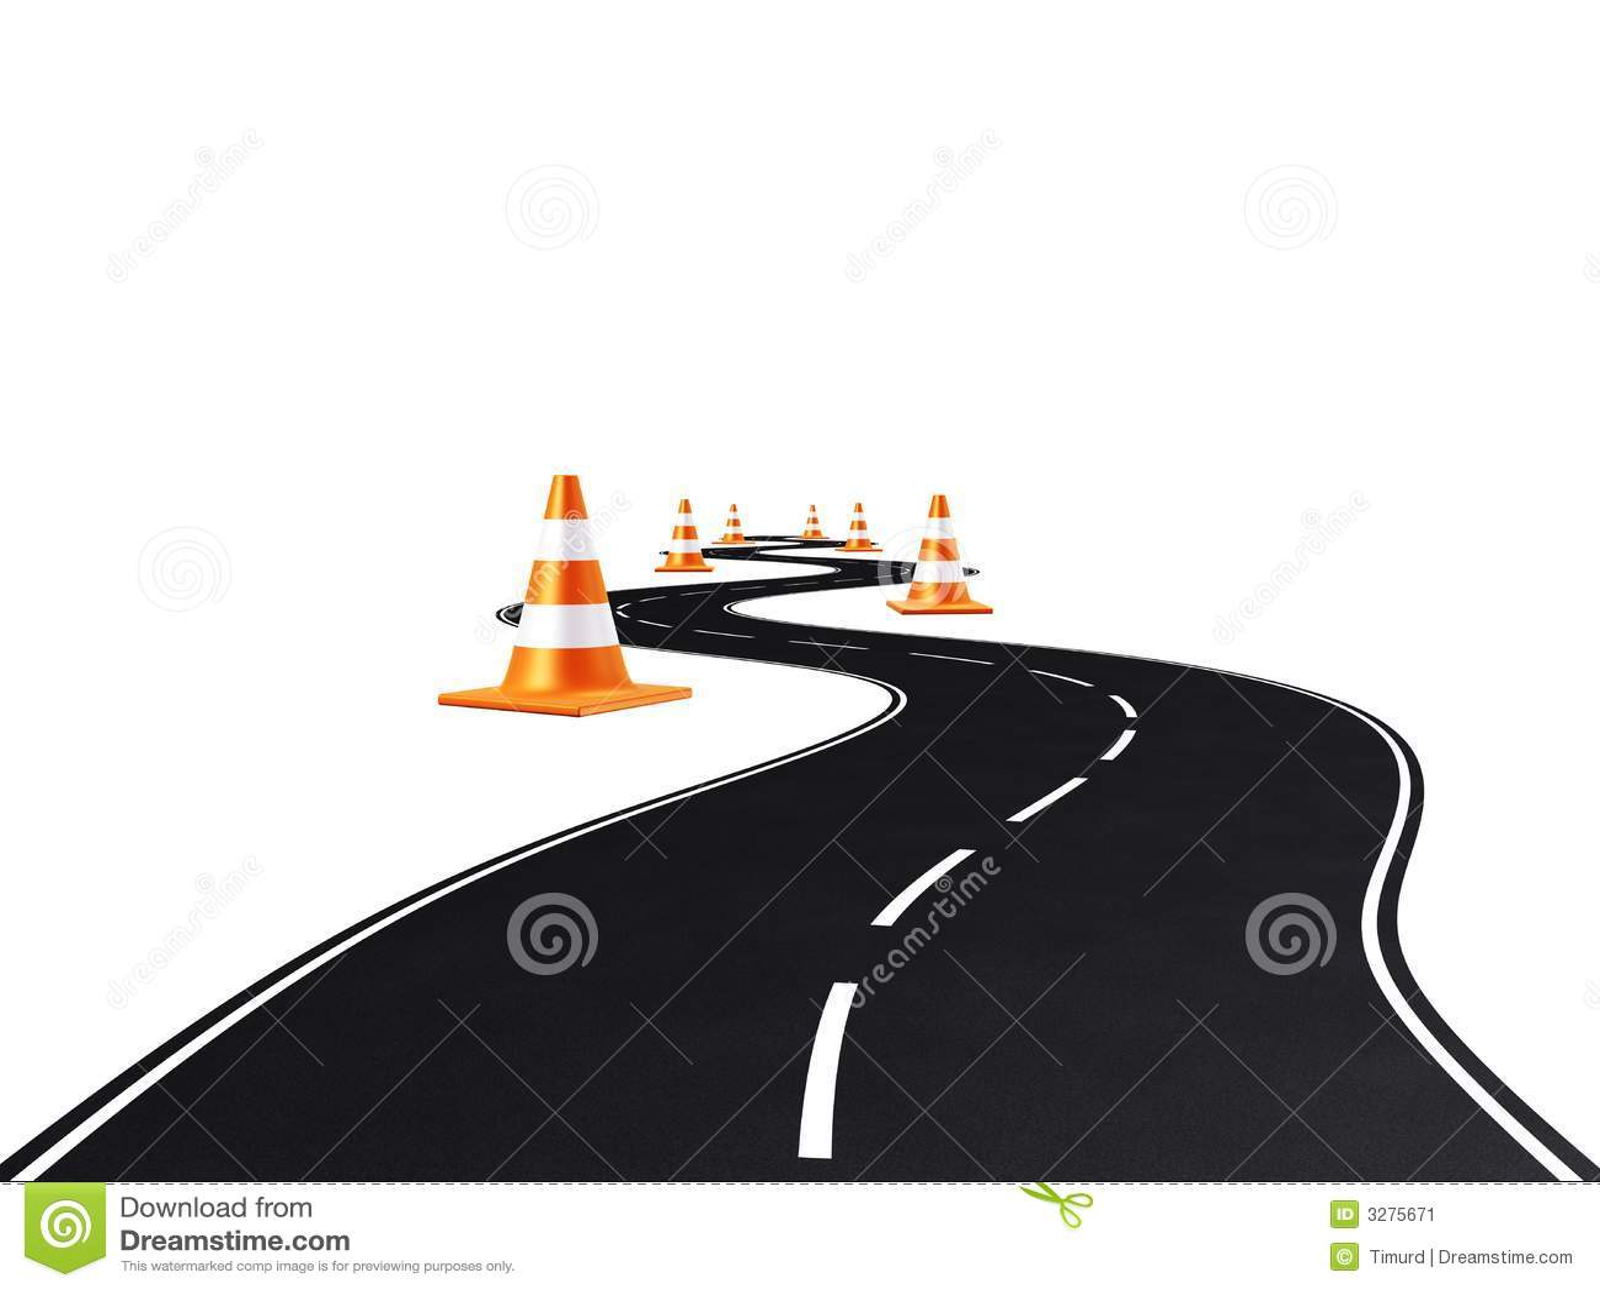 Road, highway, traffic cones